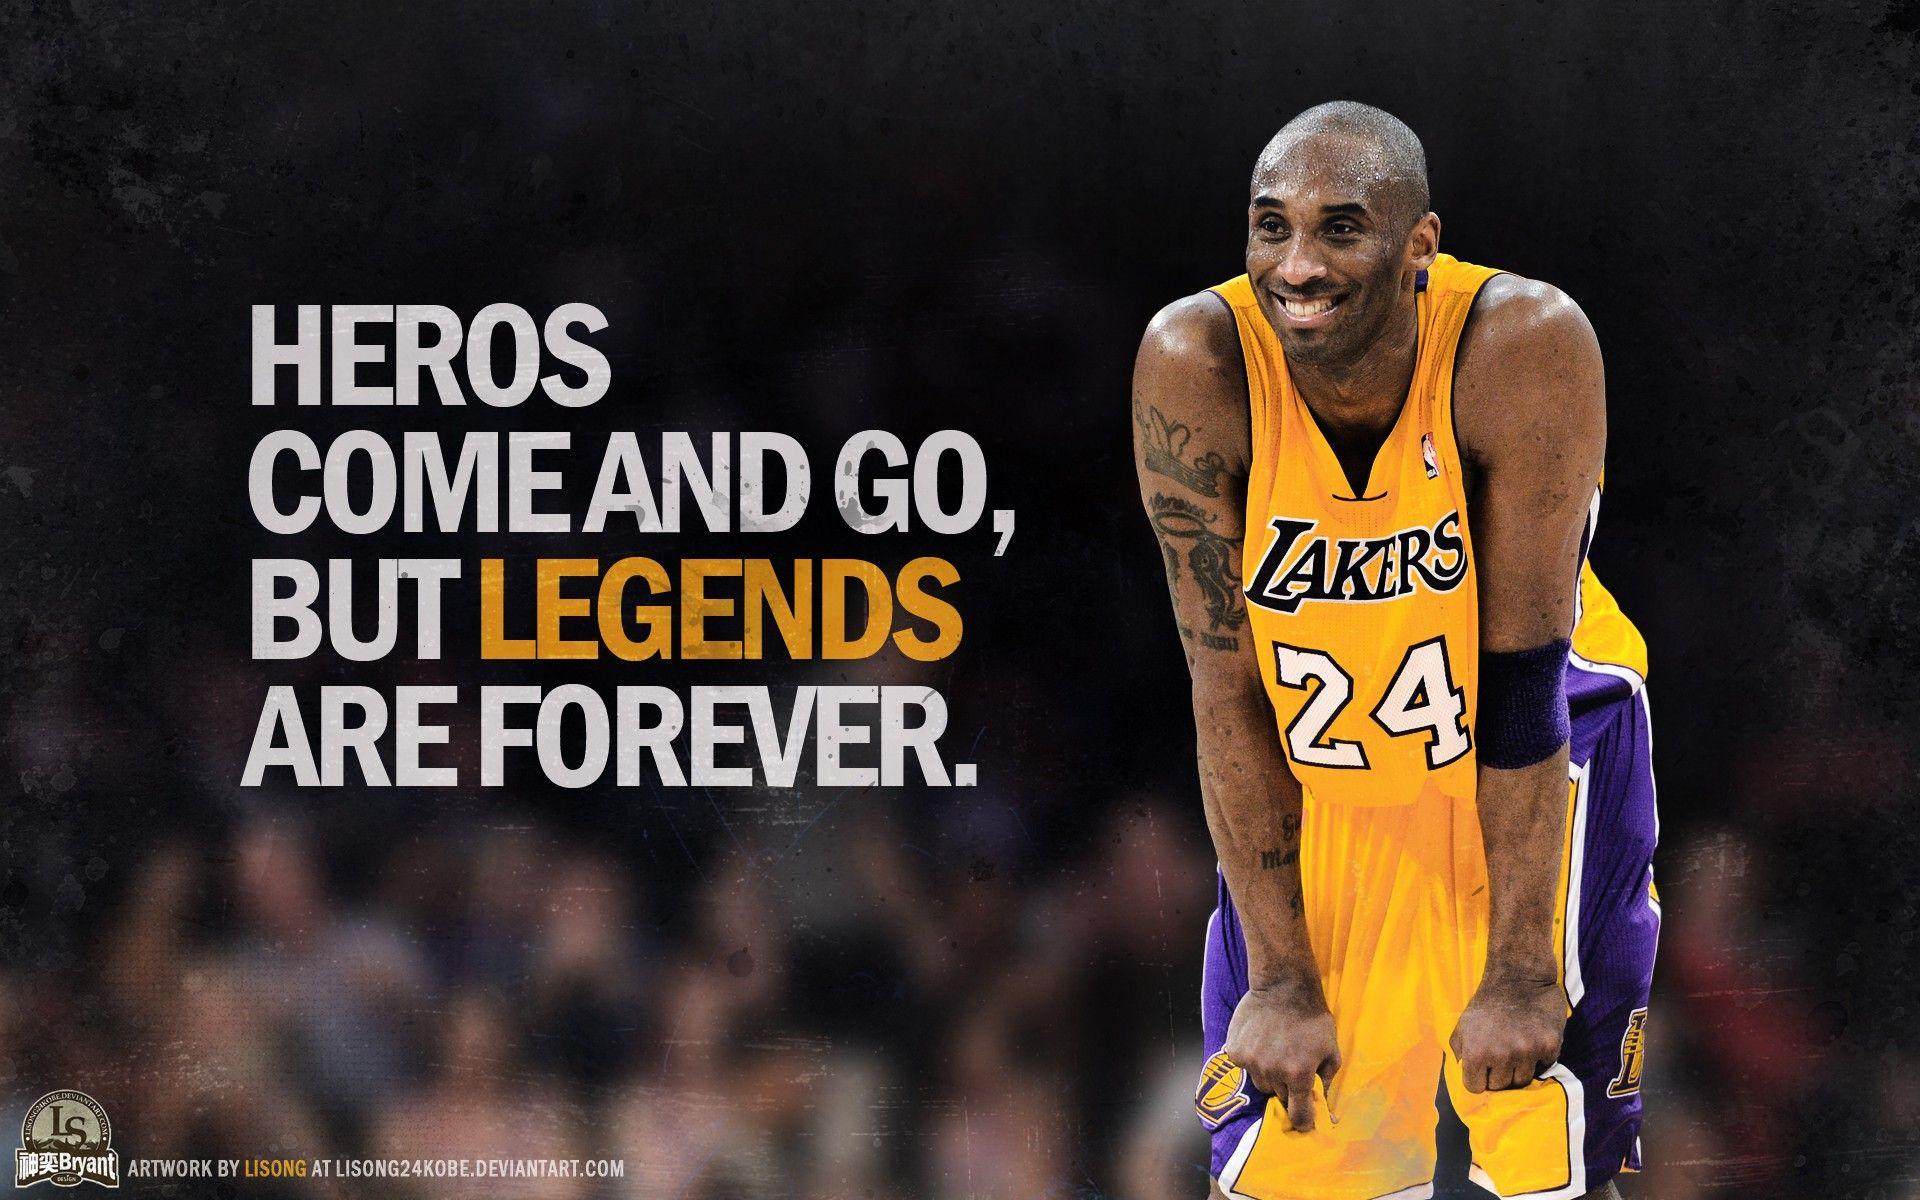 Pin By Enida Luma On Sports Pinterest Kobe Bryant Quotes Lakers